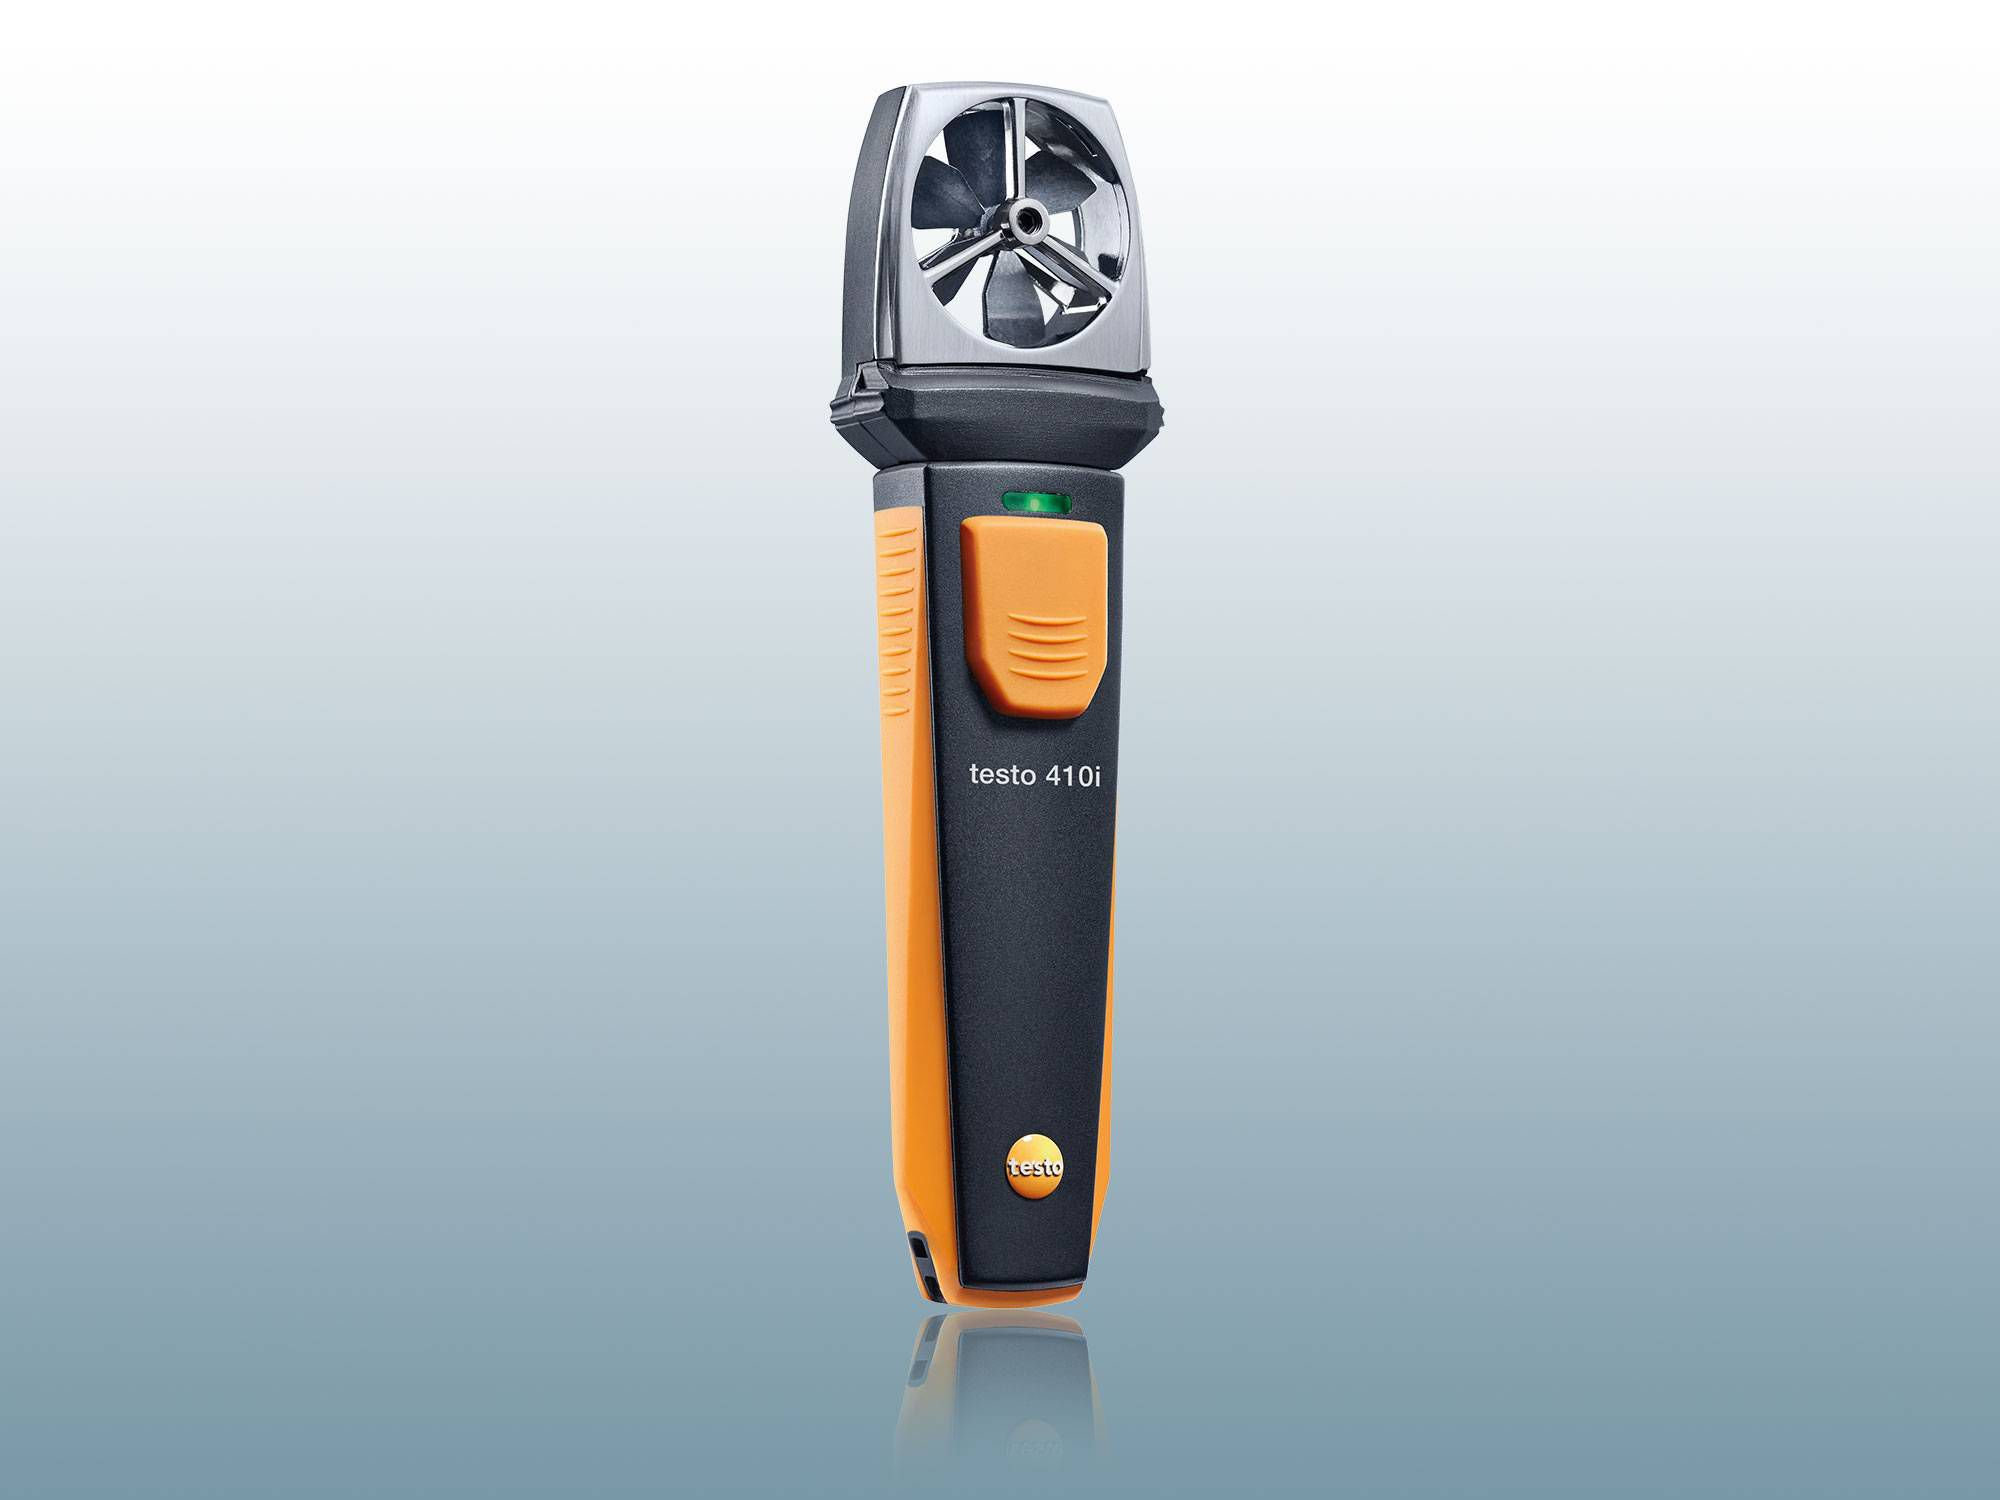 testo 410i – vane anemometer operated by smartphone